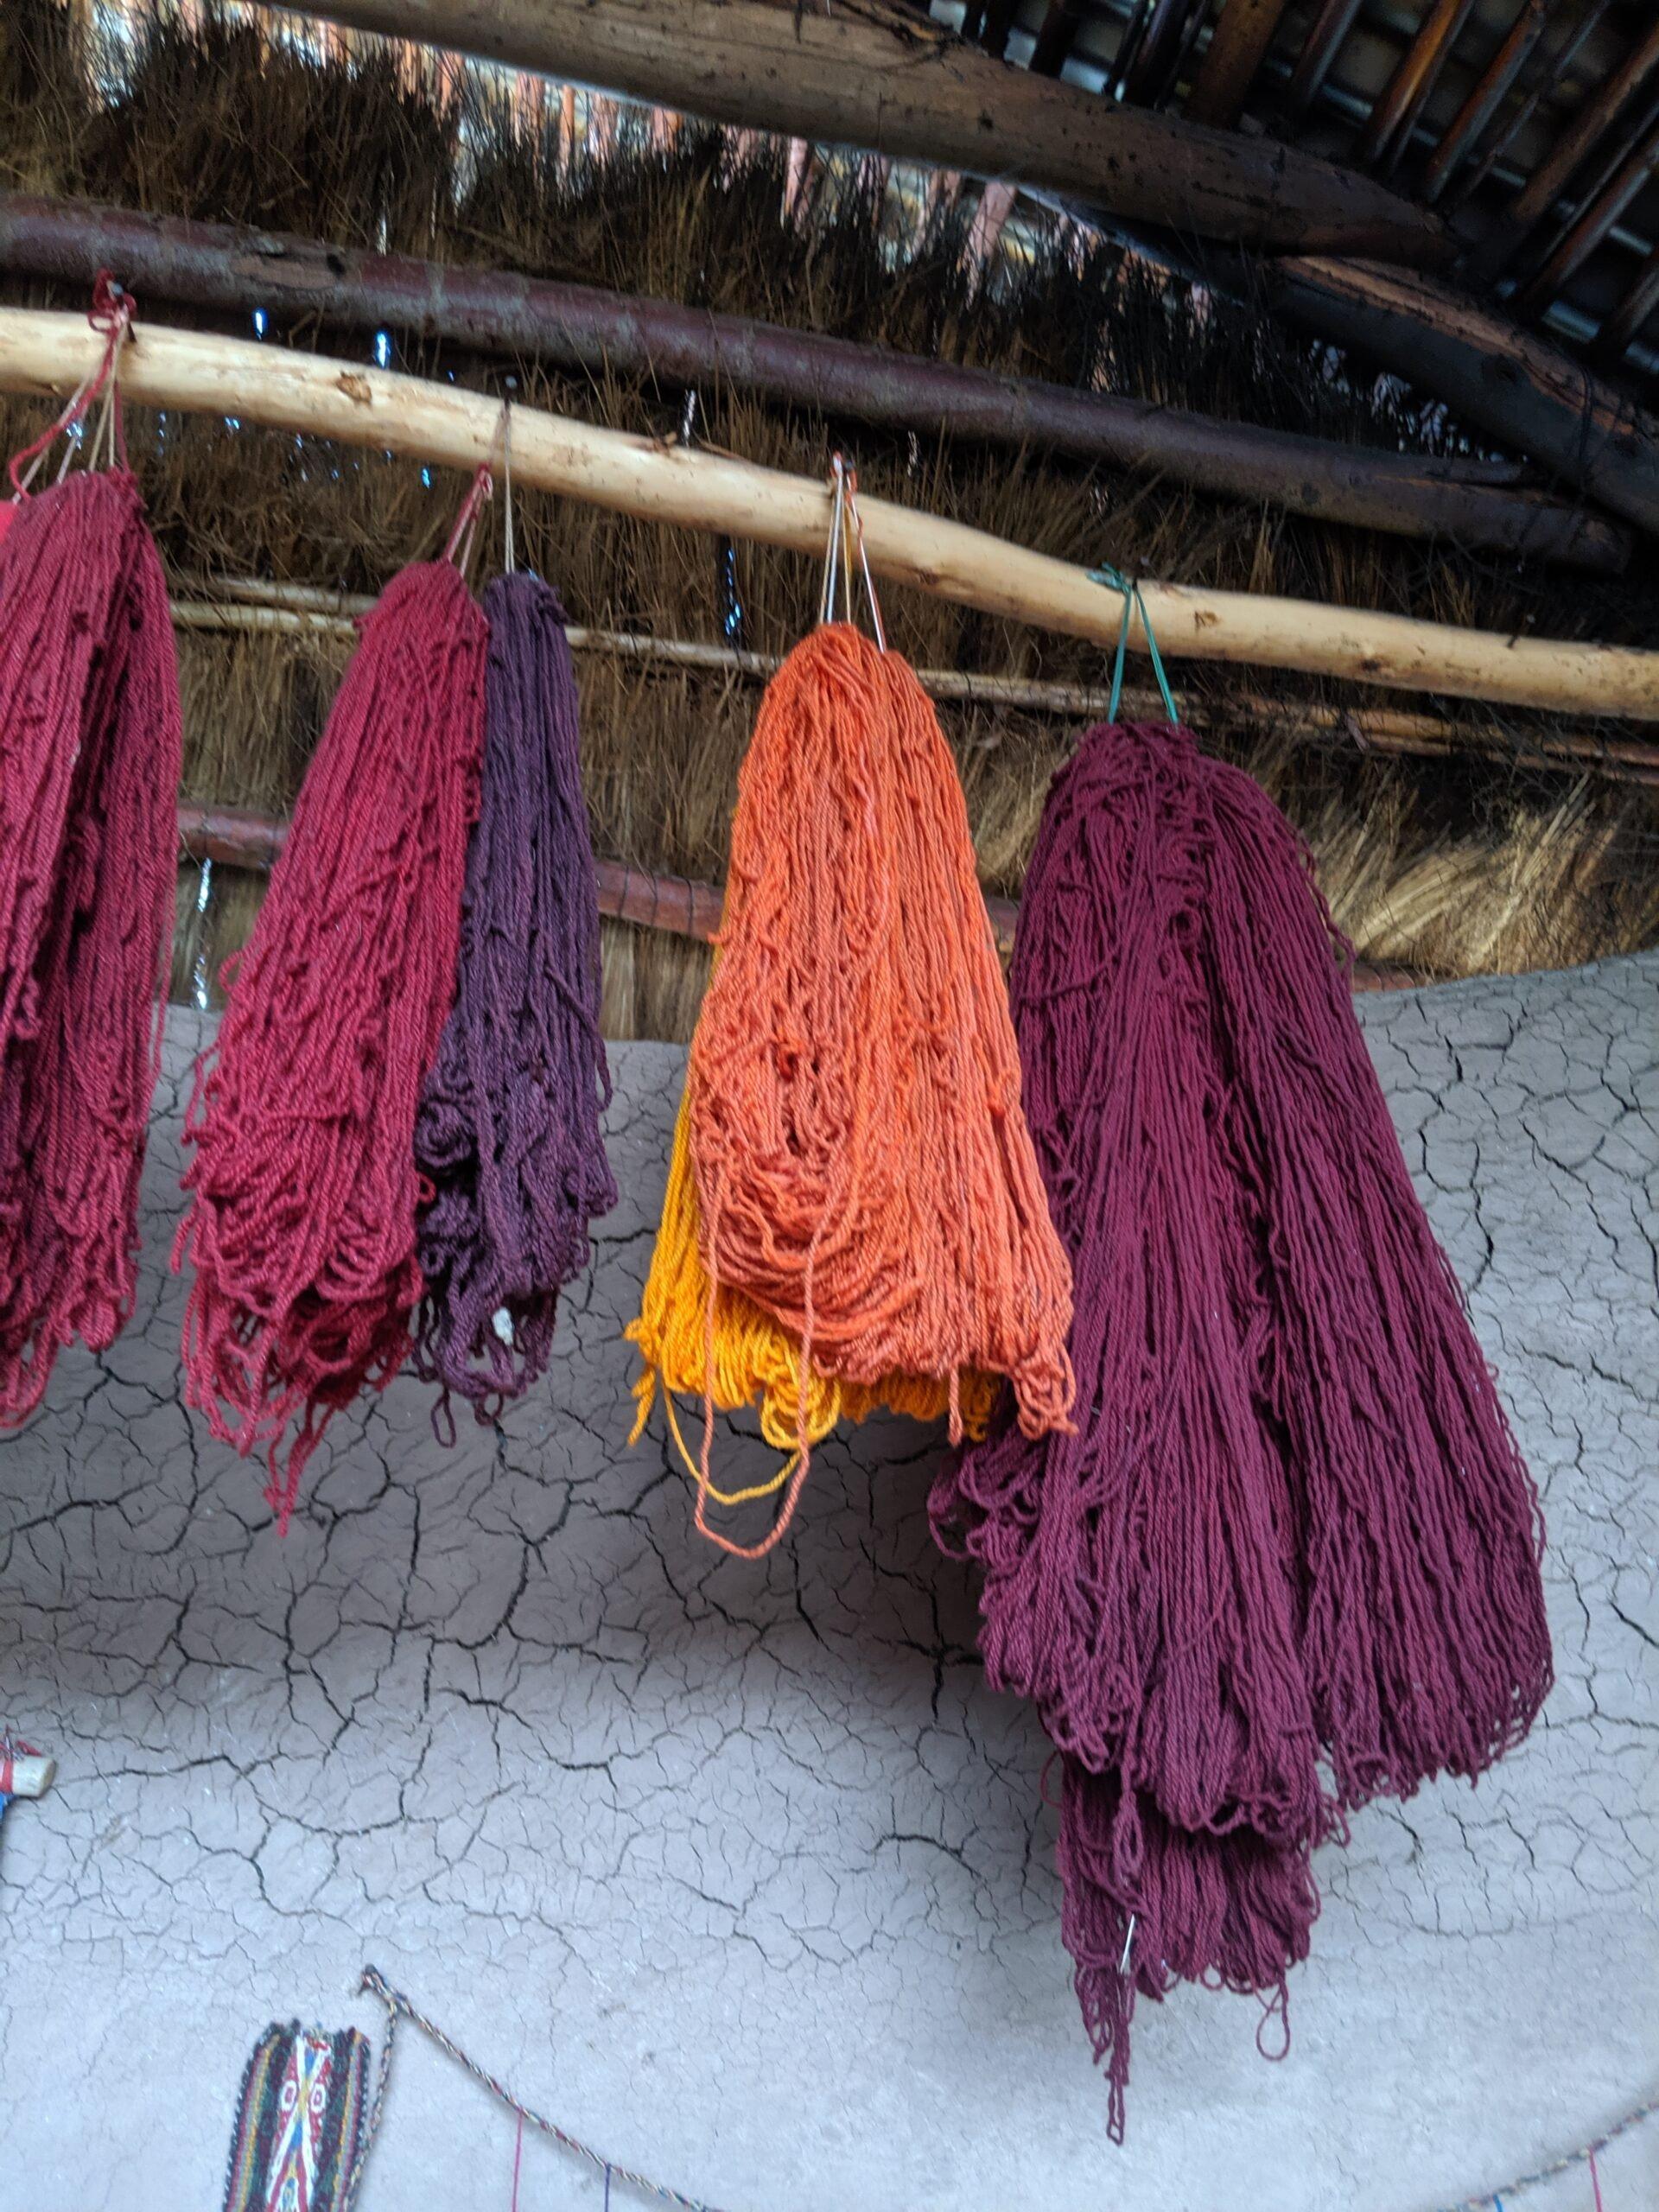 Bundles of freshly dyed yarn hanging to dry in a hut in peru.